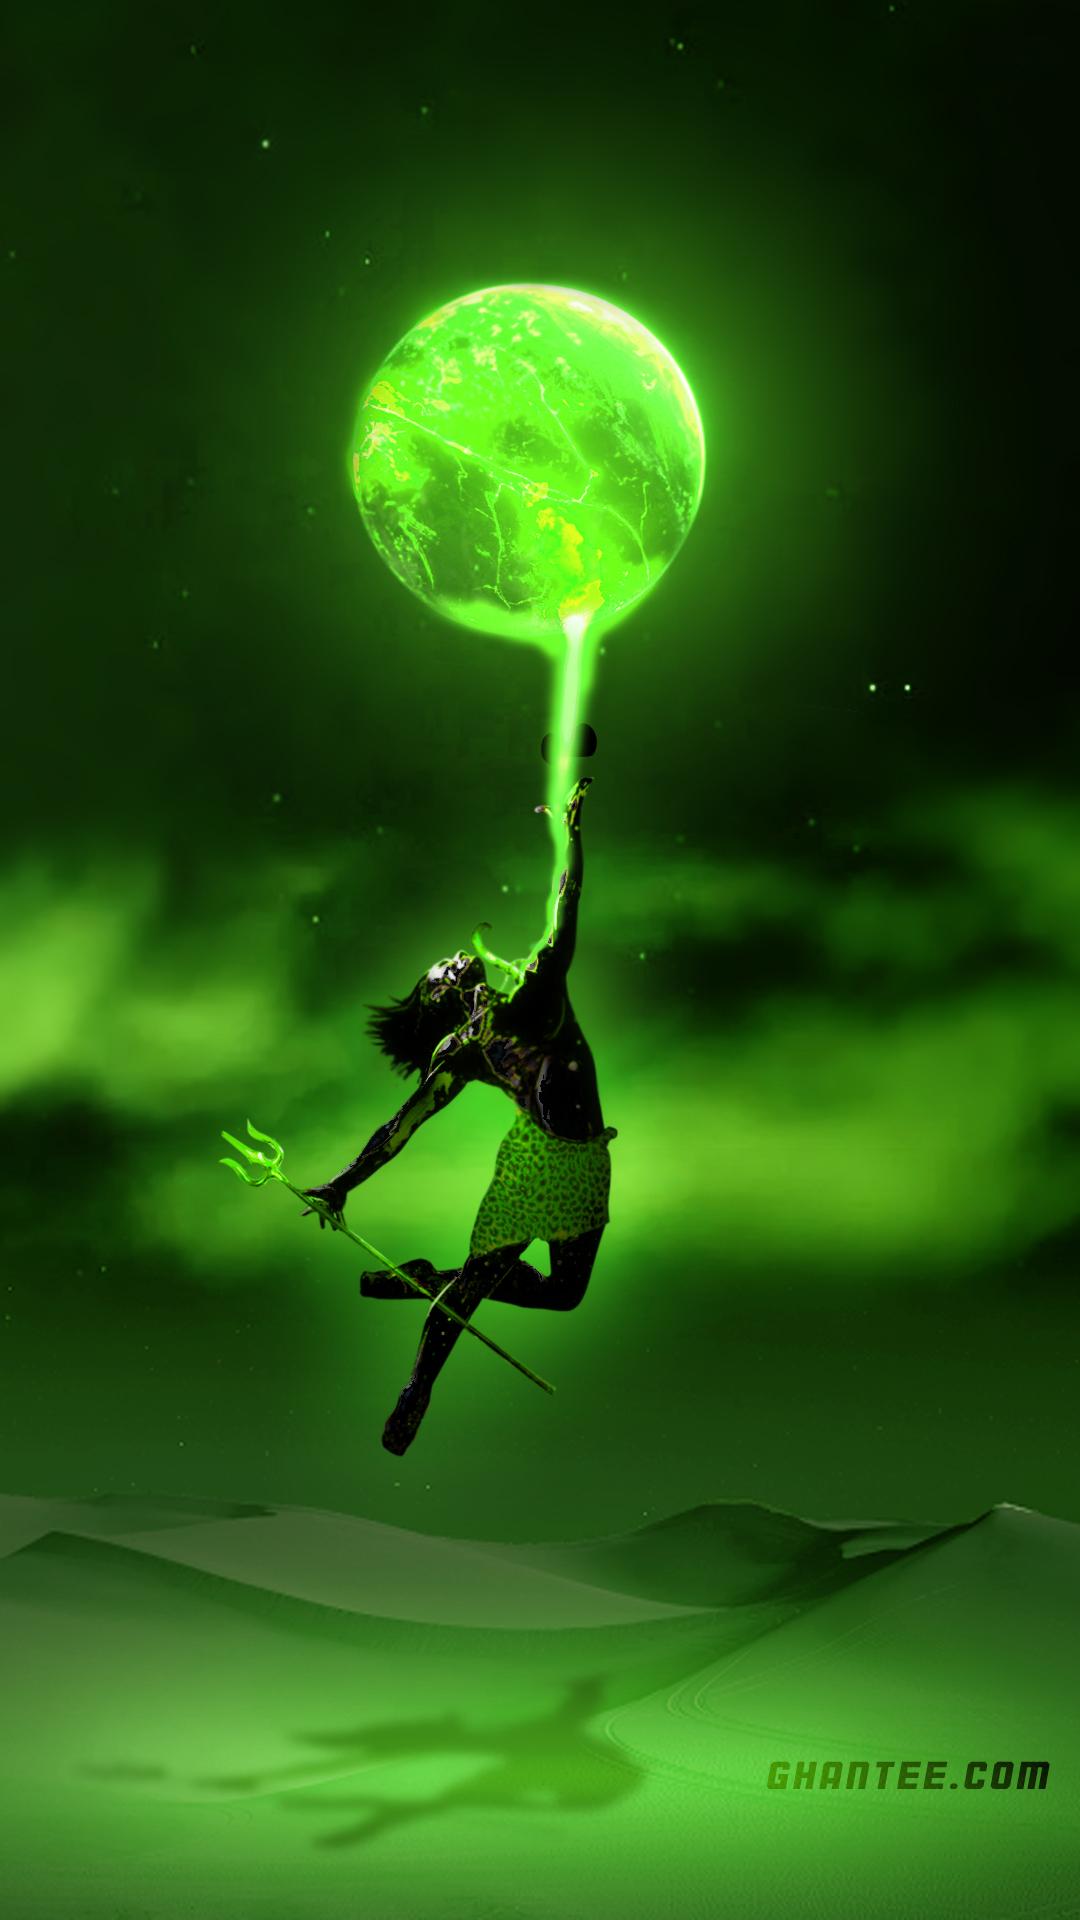 angry shiva dancing hd phone wallpaper | neon green